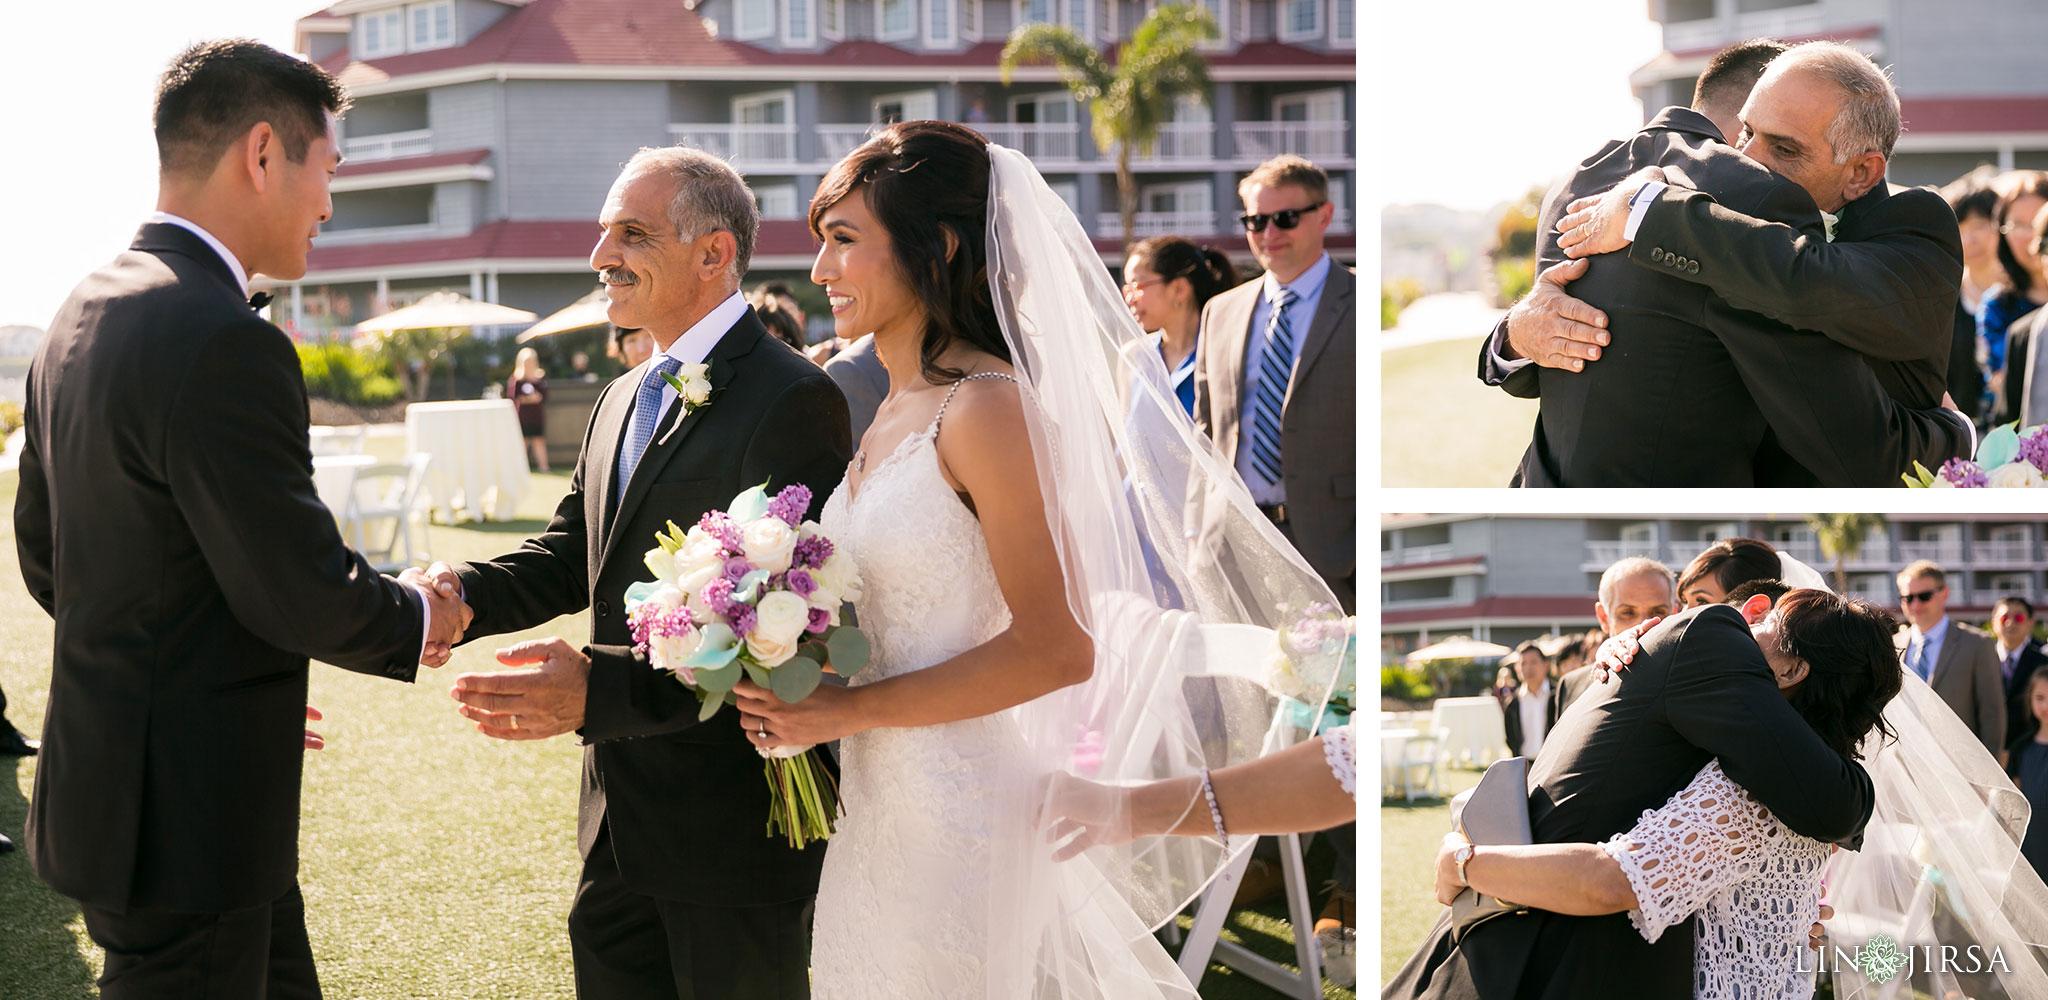 20 laguna cliffs marriott dana point wedding ceremony photography